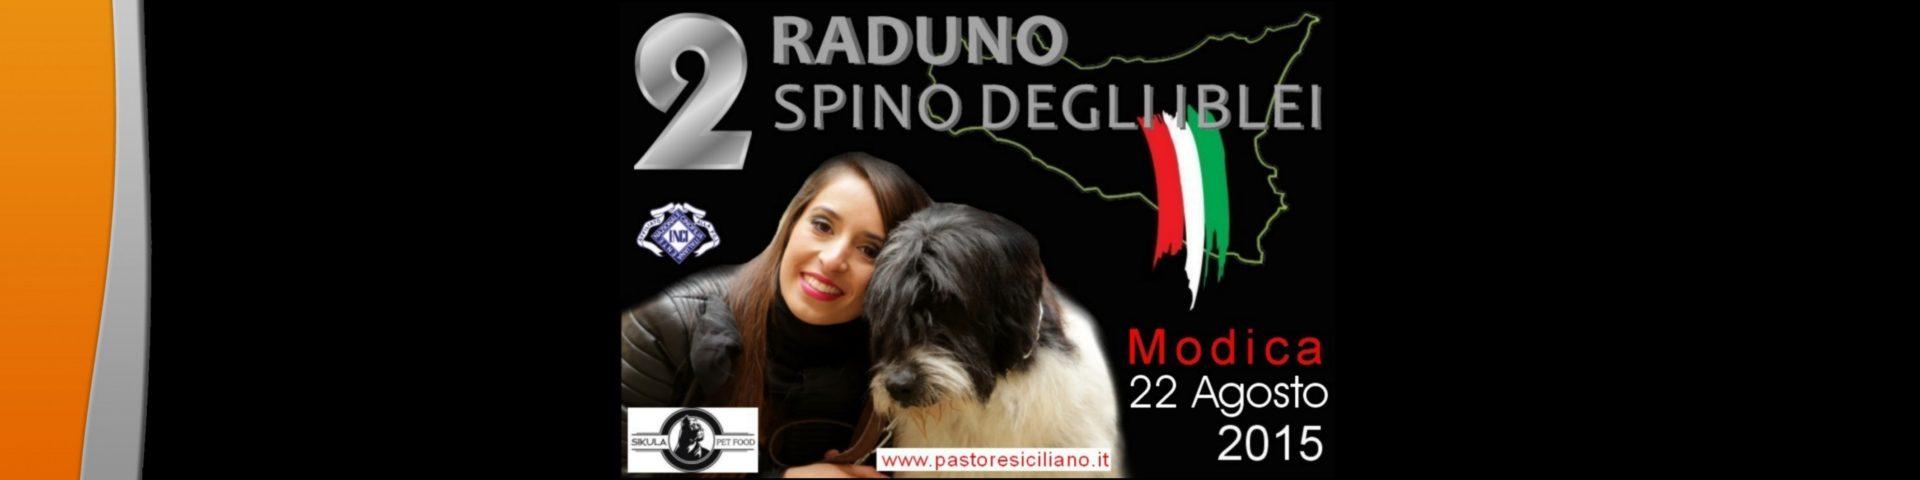 raduno_2015